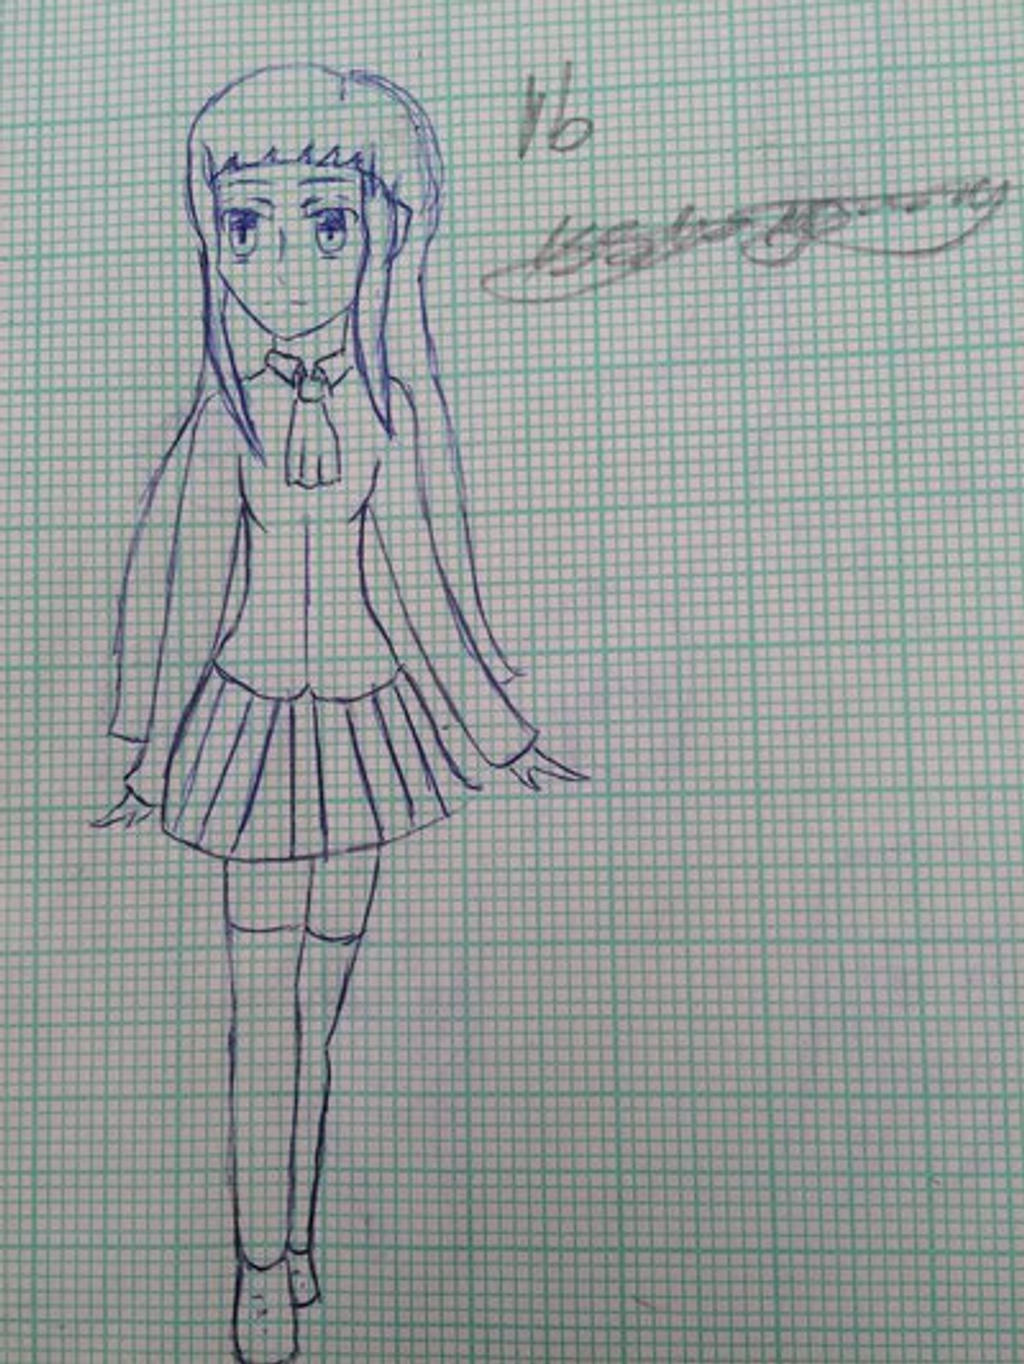 Ib sketch by epicbubble7